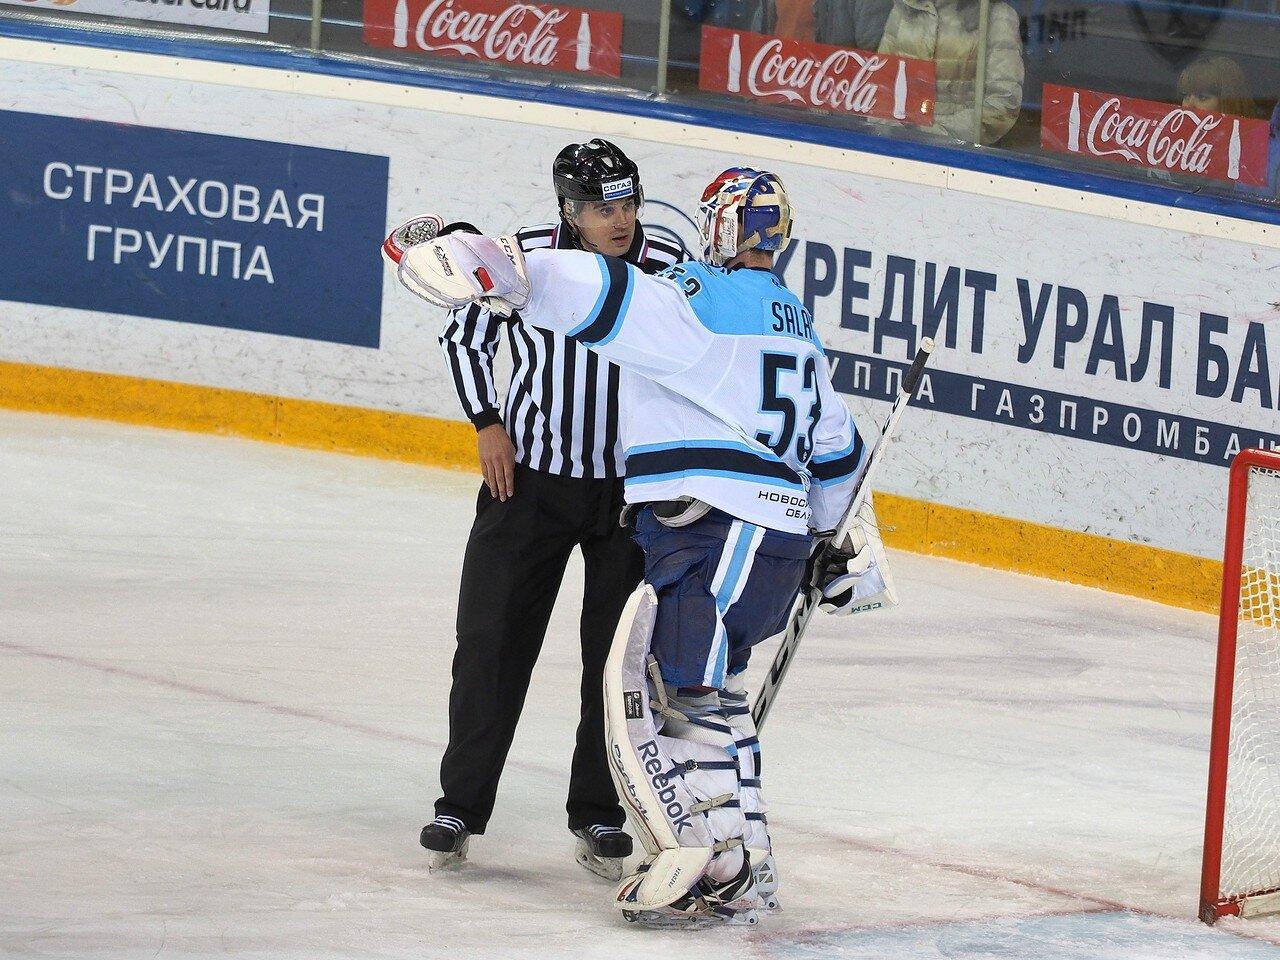 90Плей-офф 2016 Восток 1/2 Металлург - Сибирь 10.03.2016